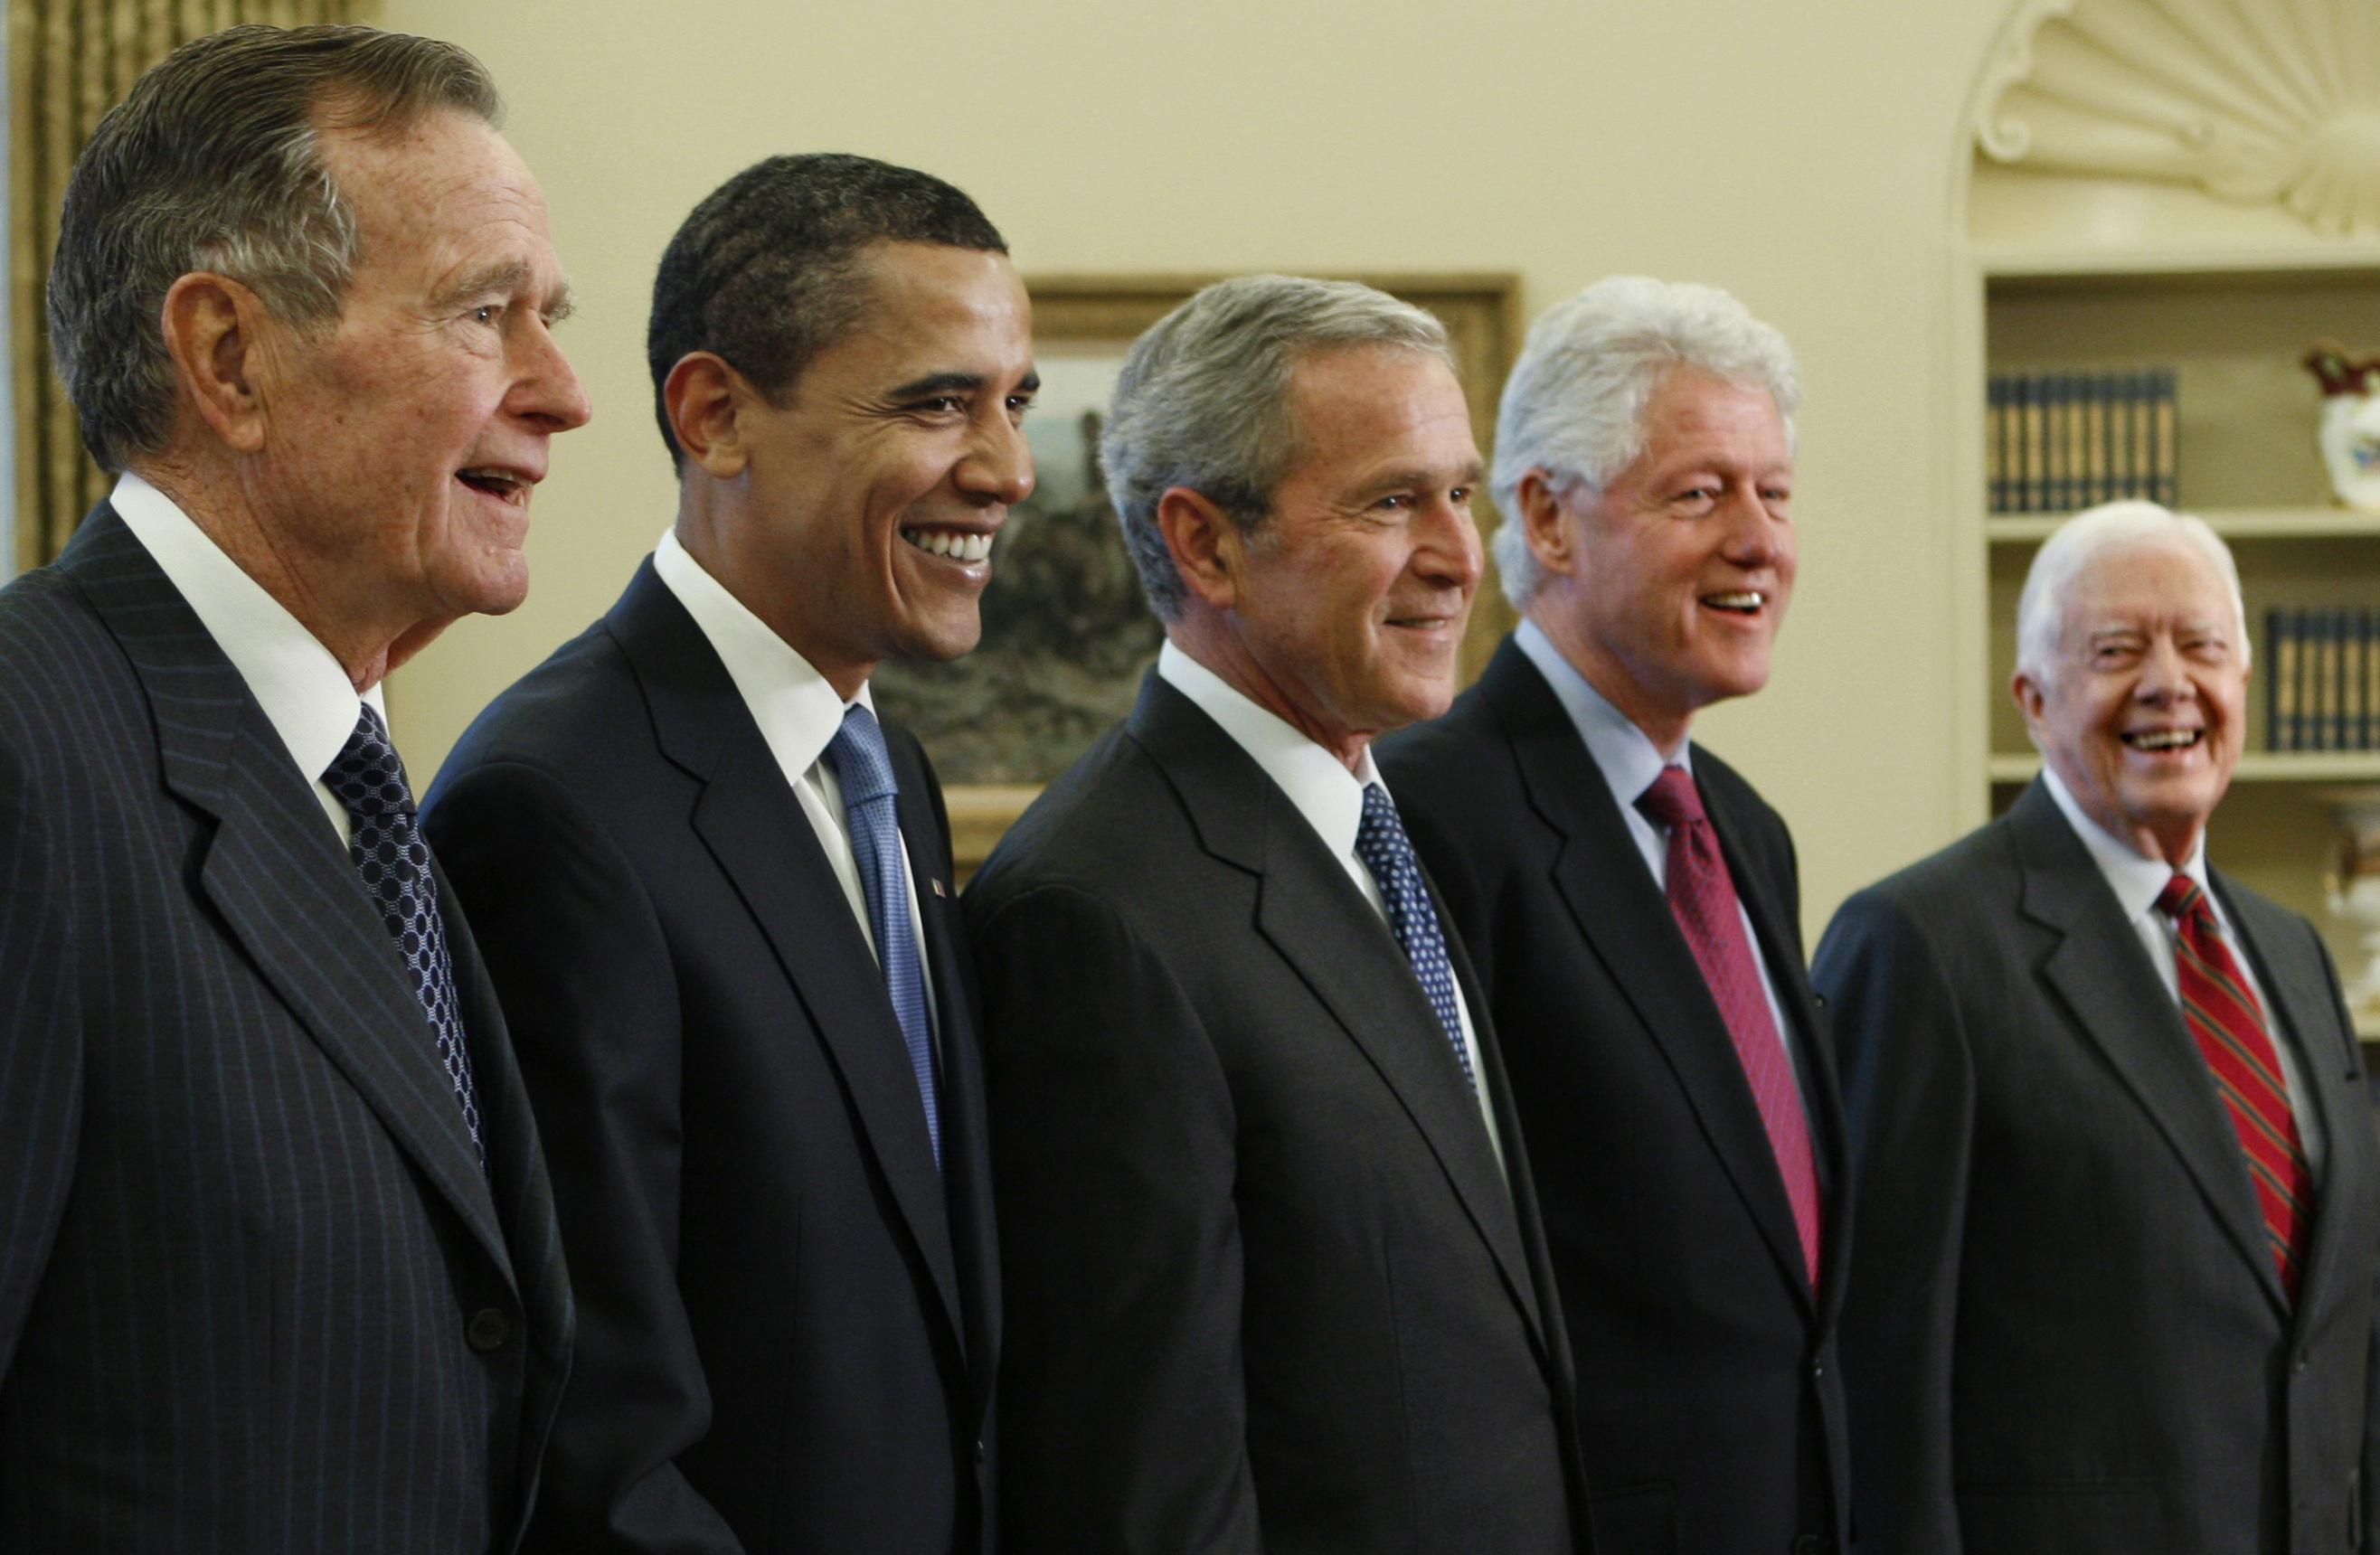 High Resolution Wallpaper | Presidents 2632x1720 px